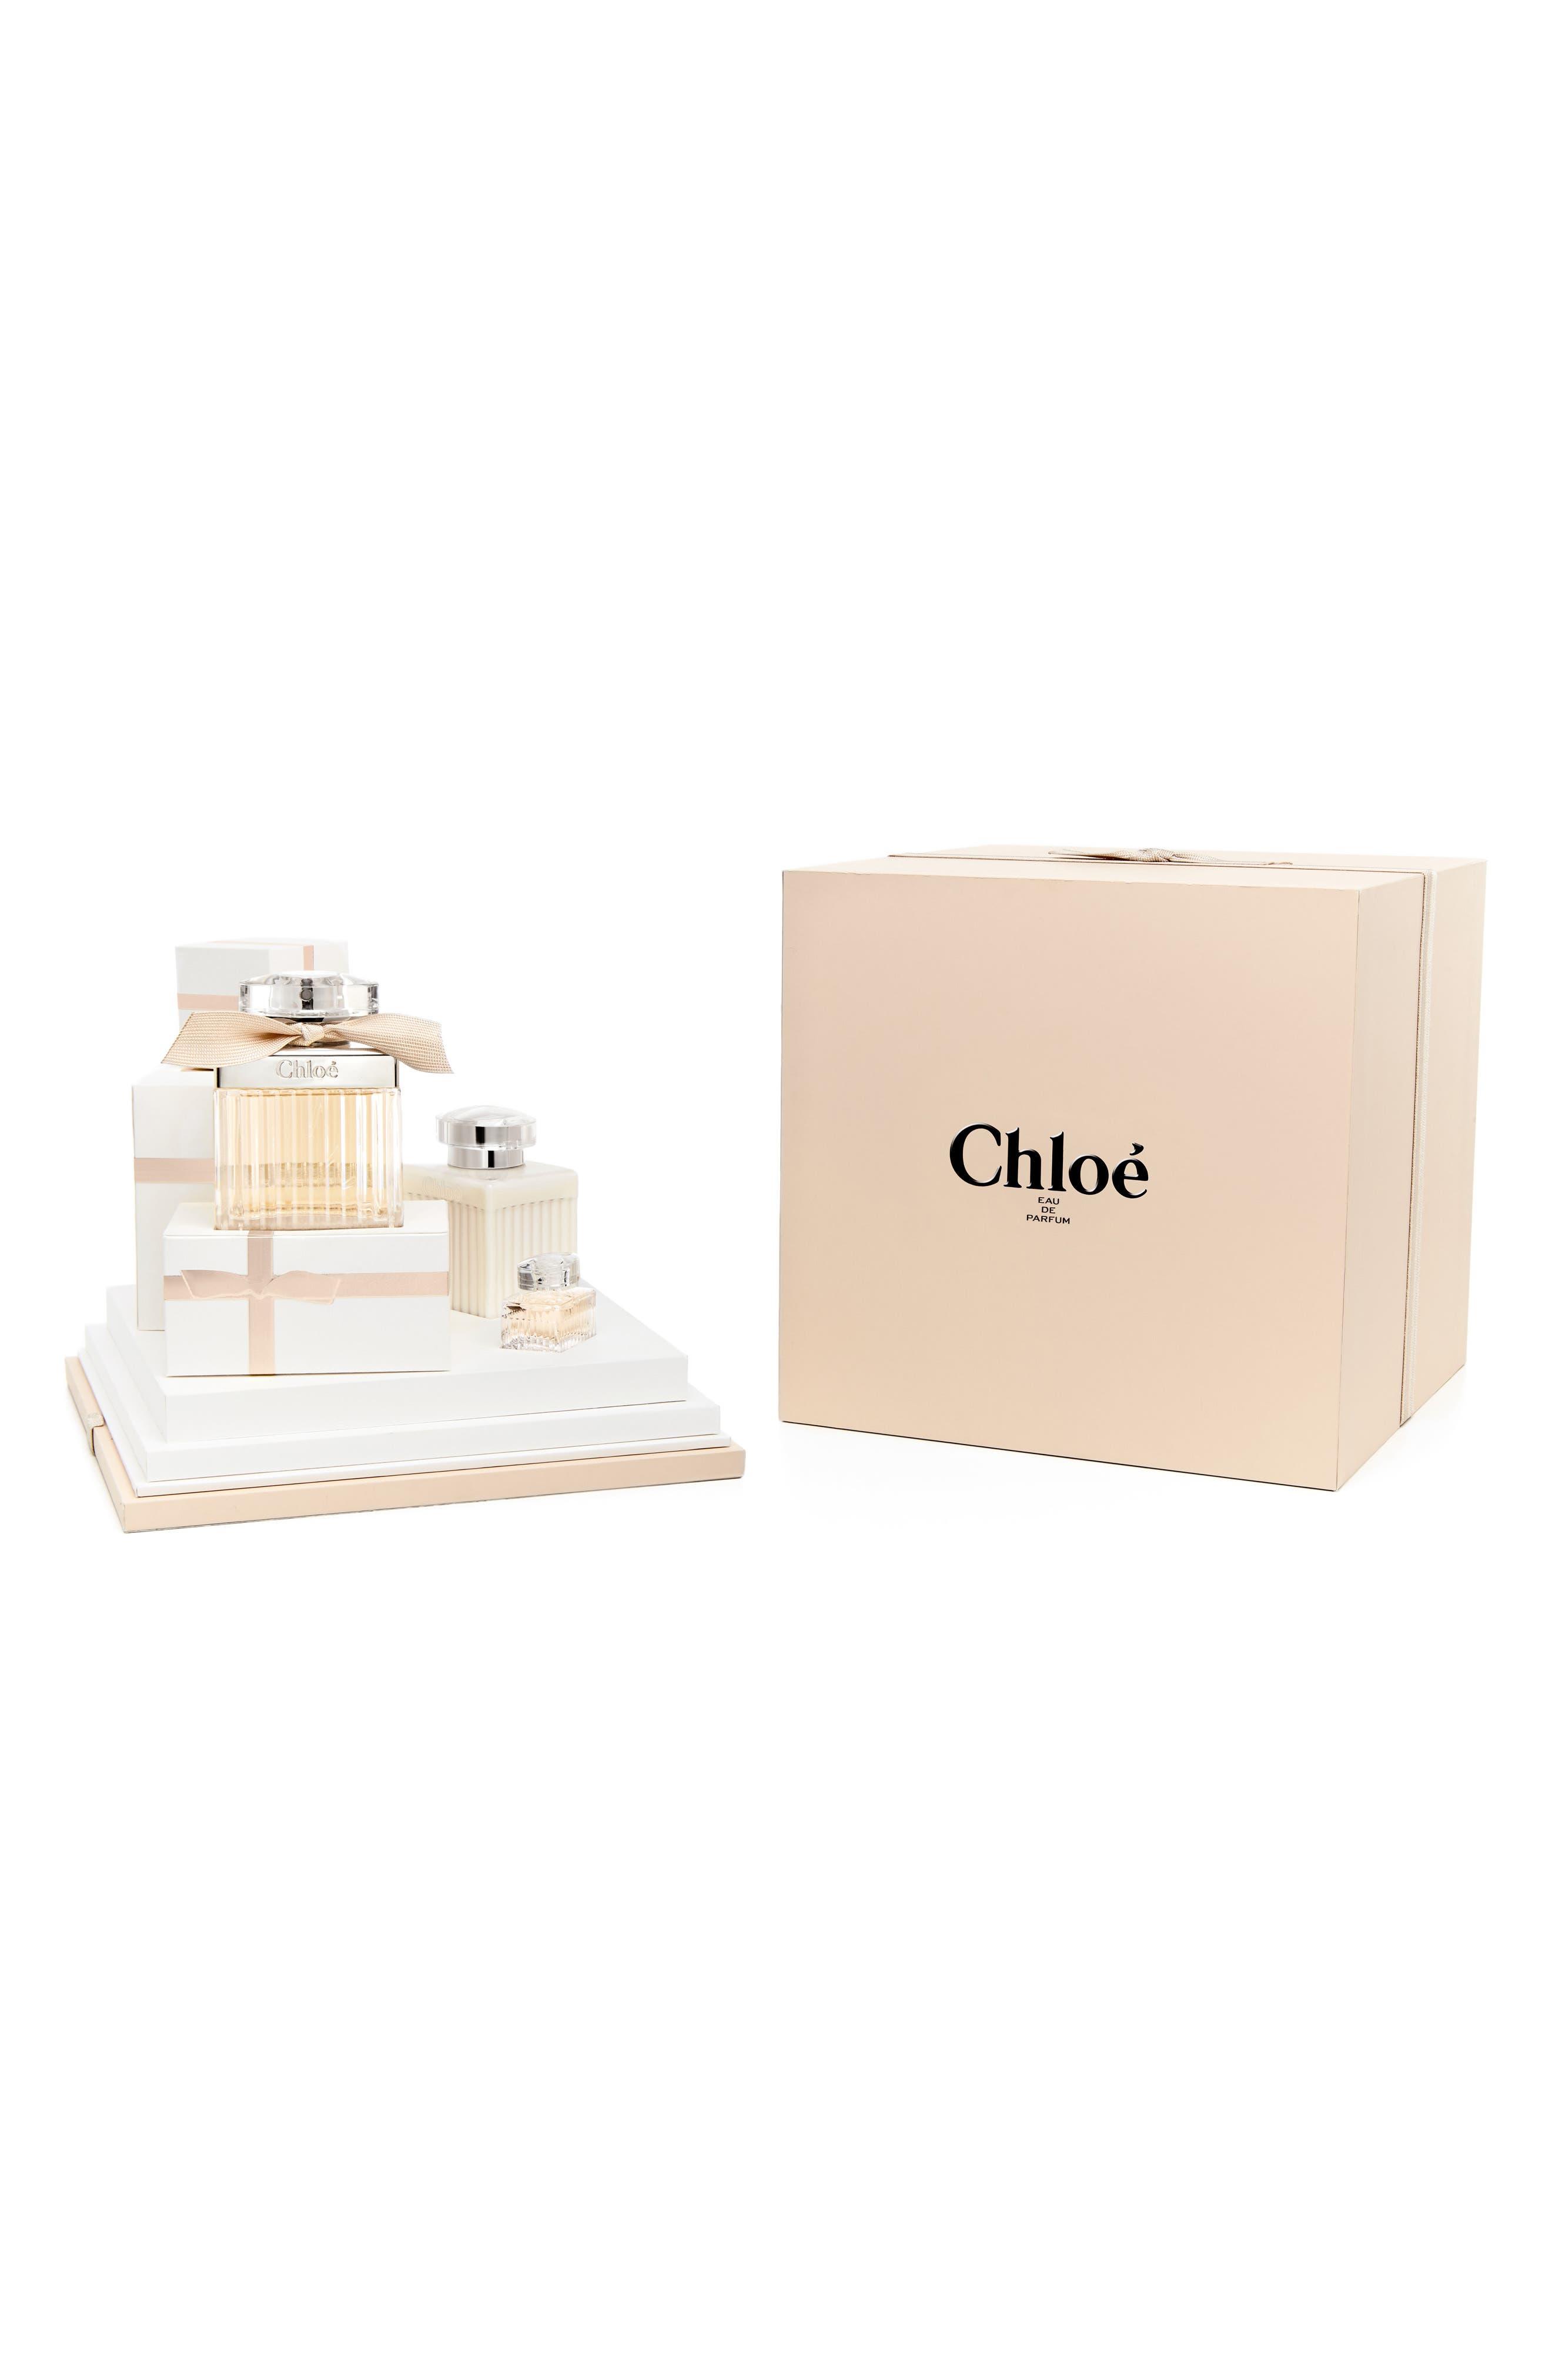 Main Image - Chloé Signature Deluxe Set ($167 Value)